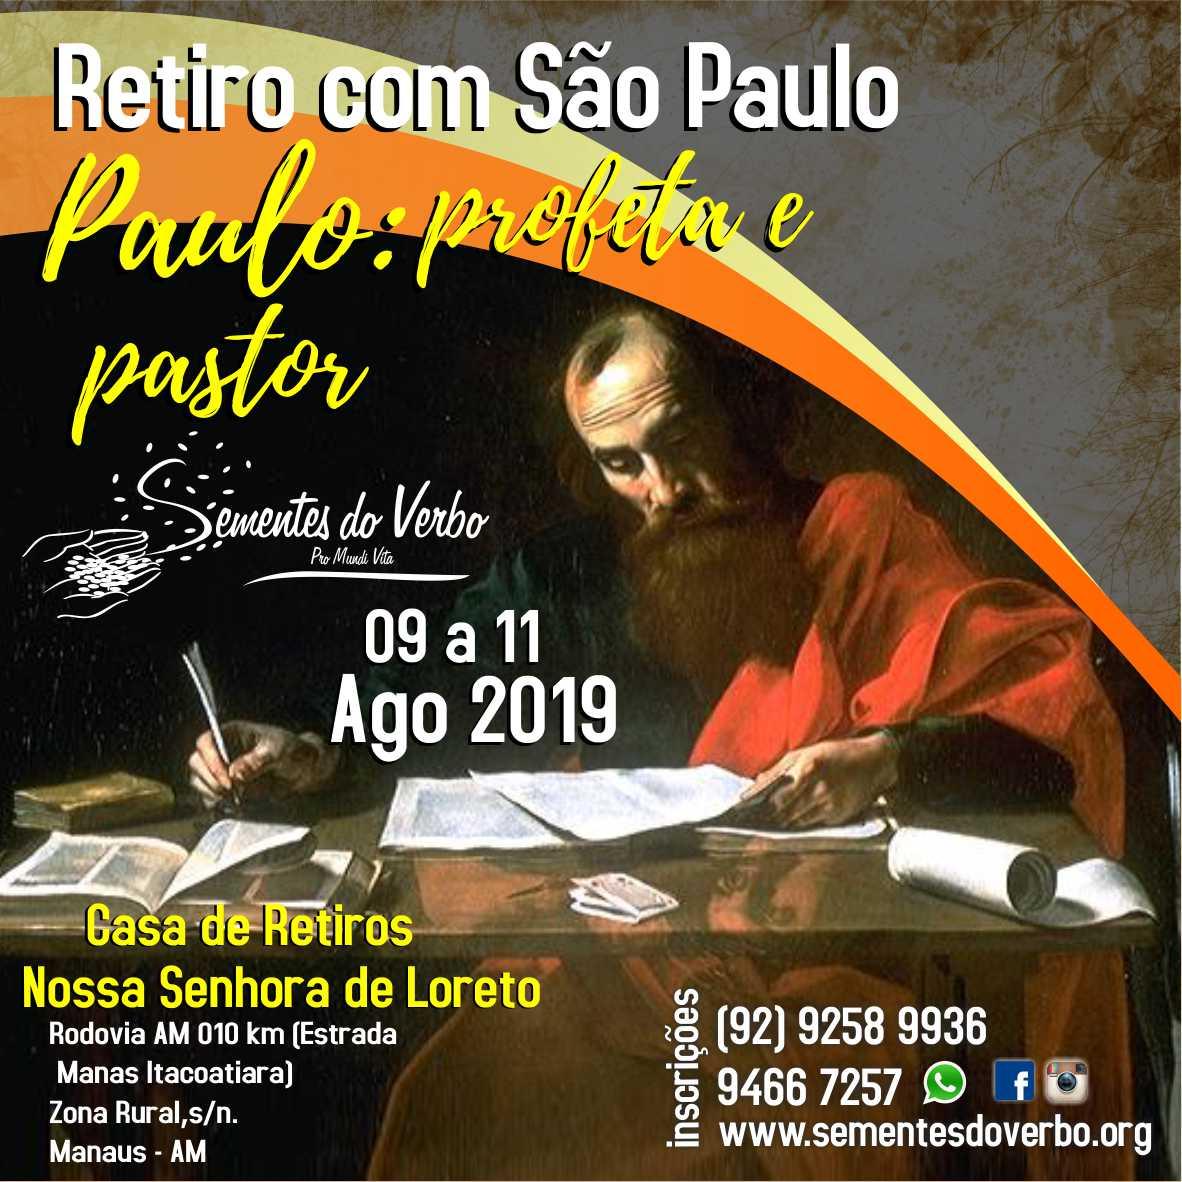 Retiro com São Paulo avatar _Manaus19.jpg